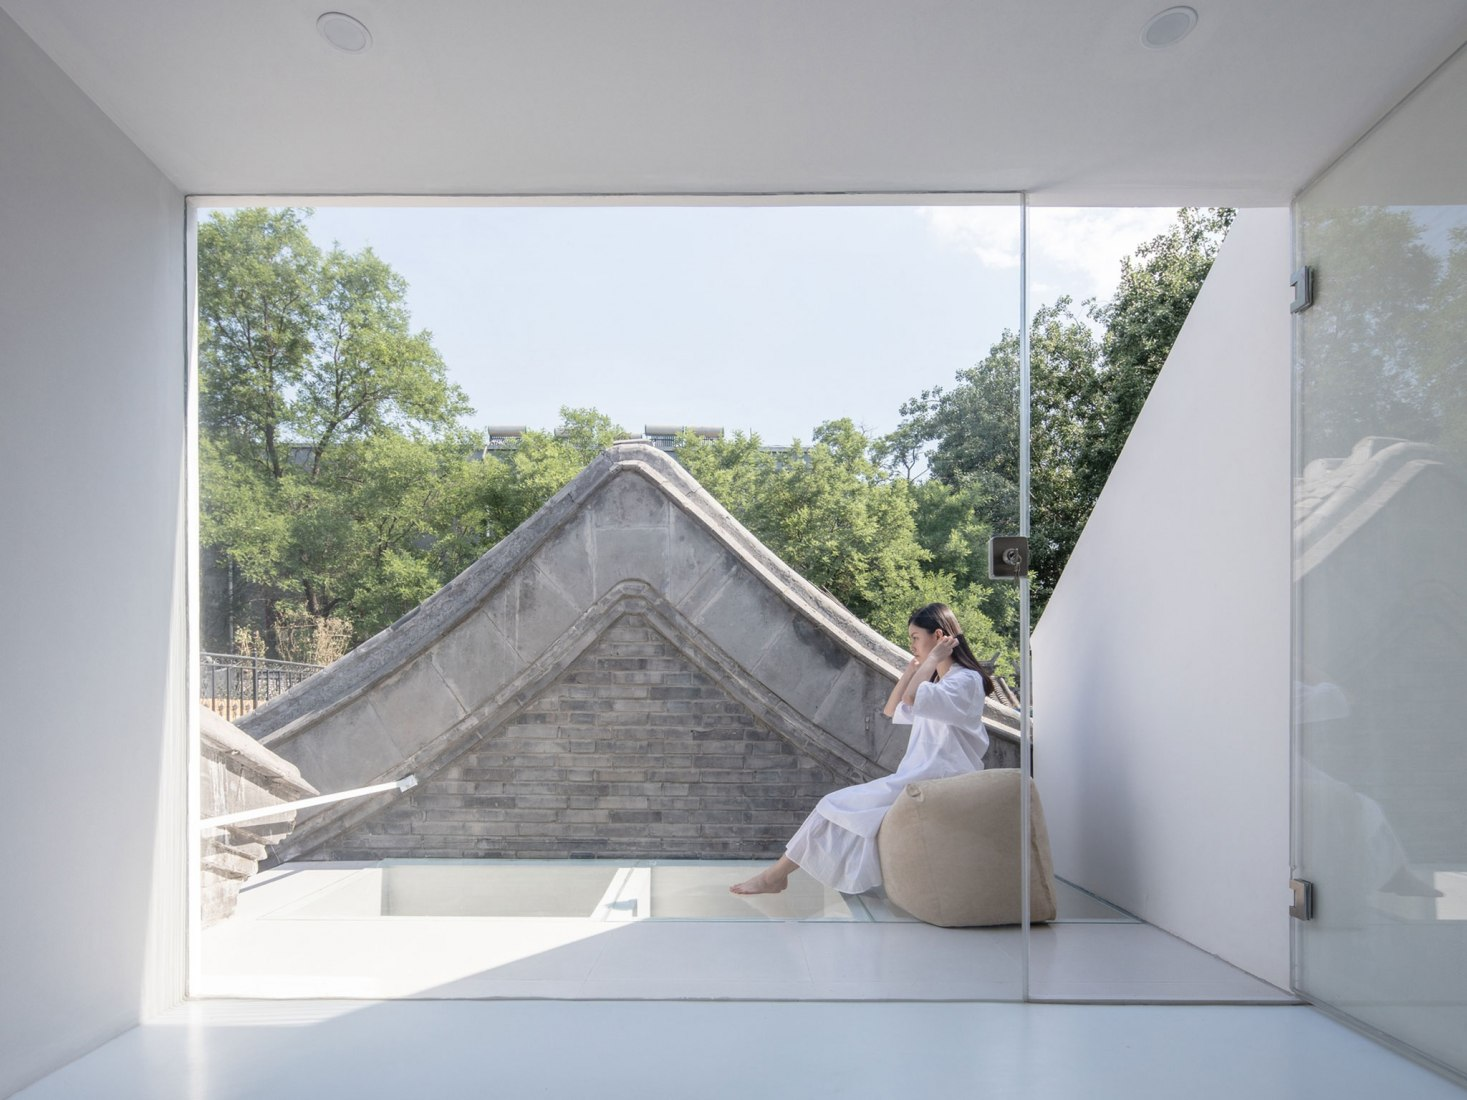 'Tsuo' dwelling by Wonder Architects. Photograph © Haiting Sun